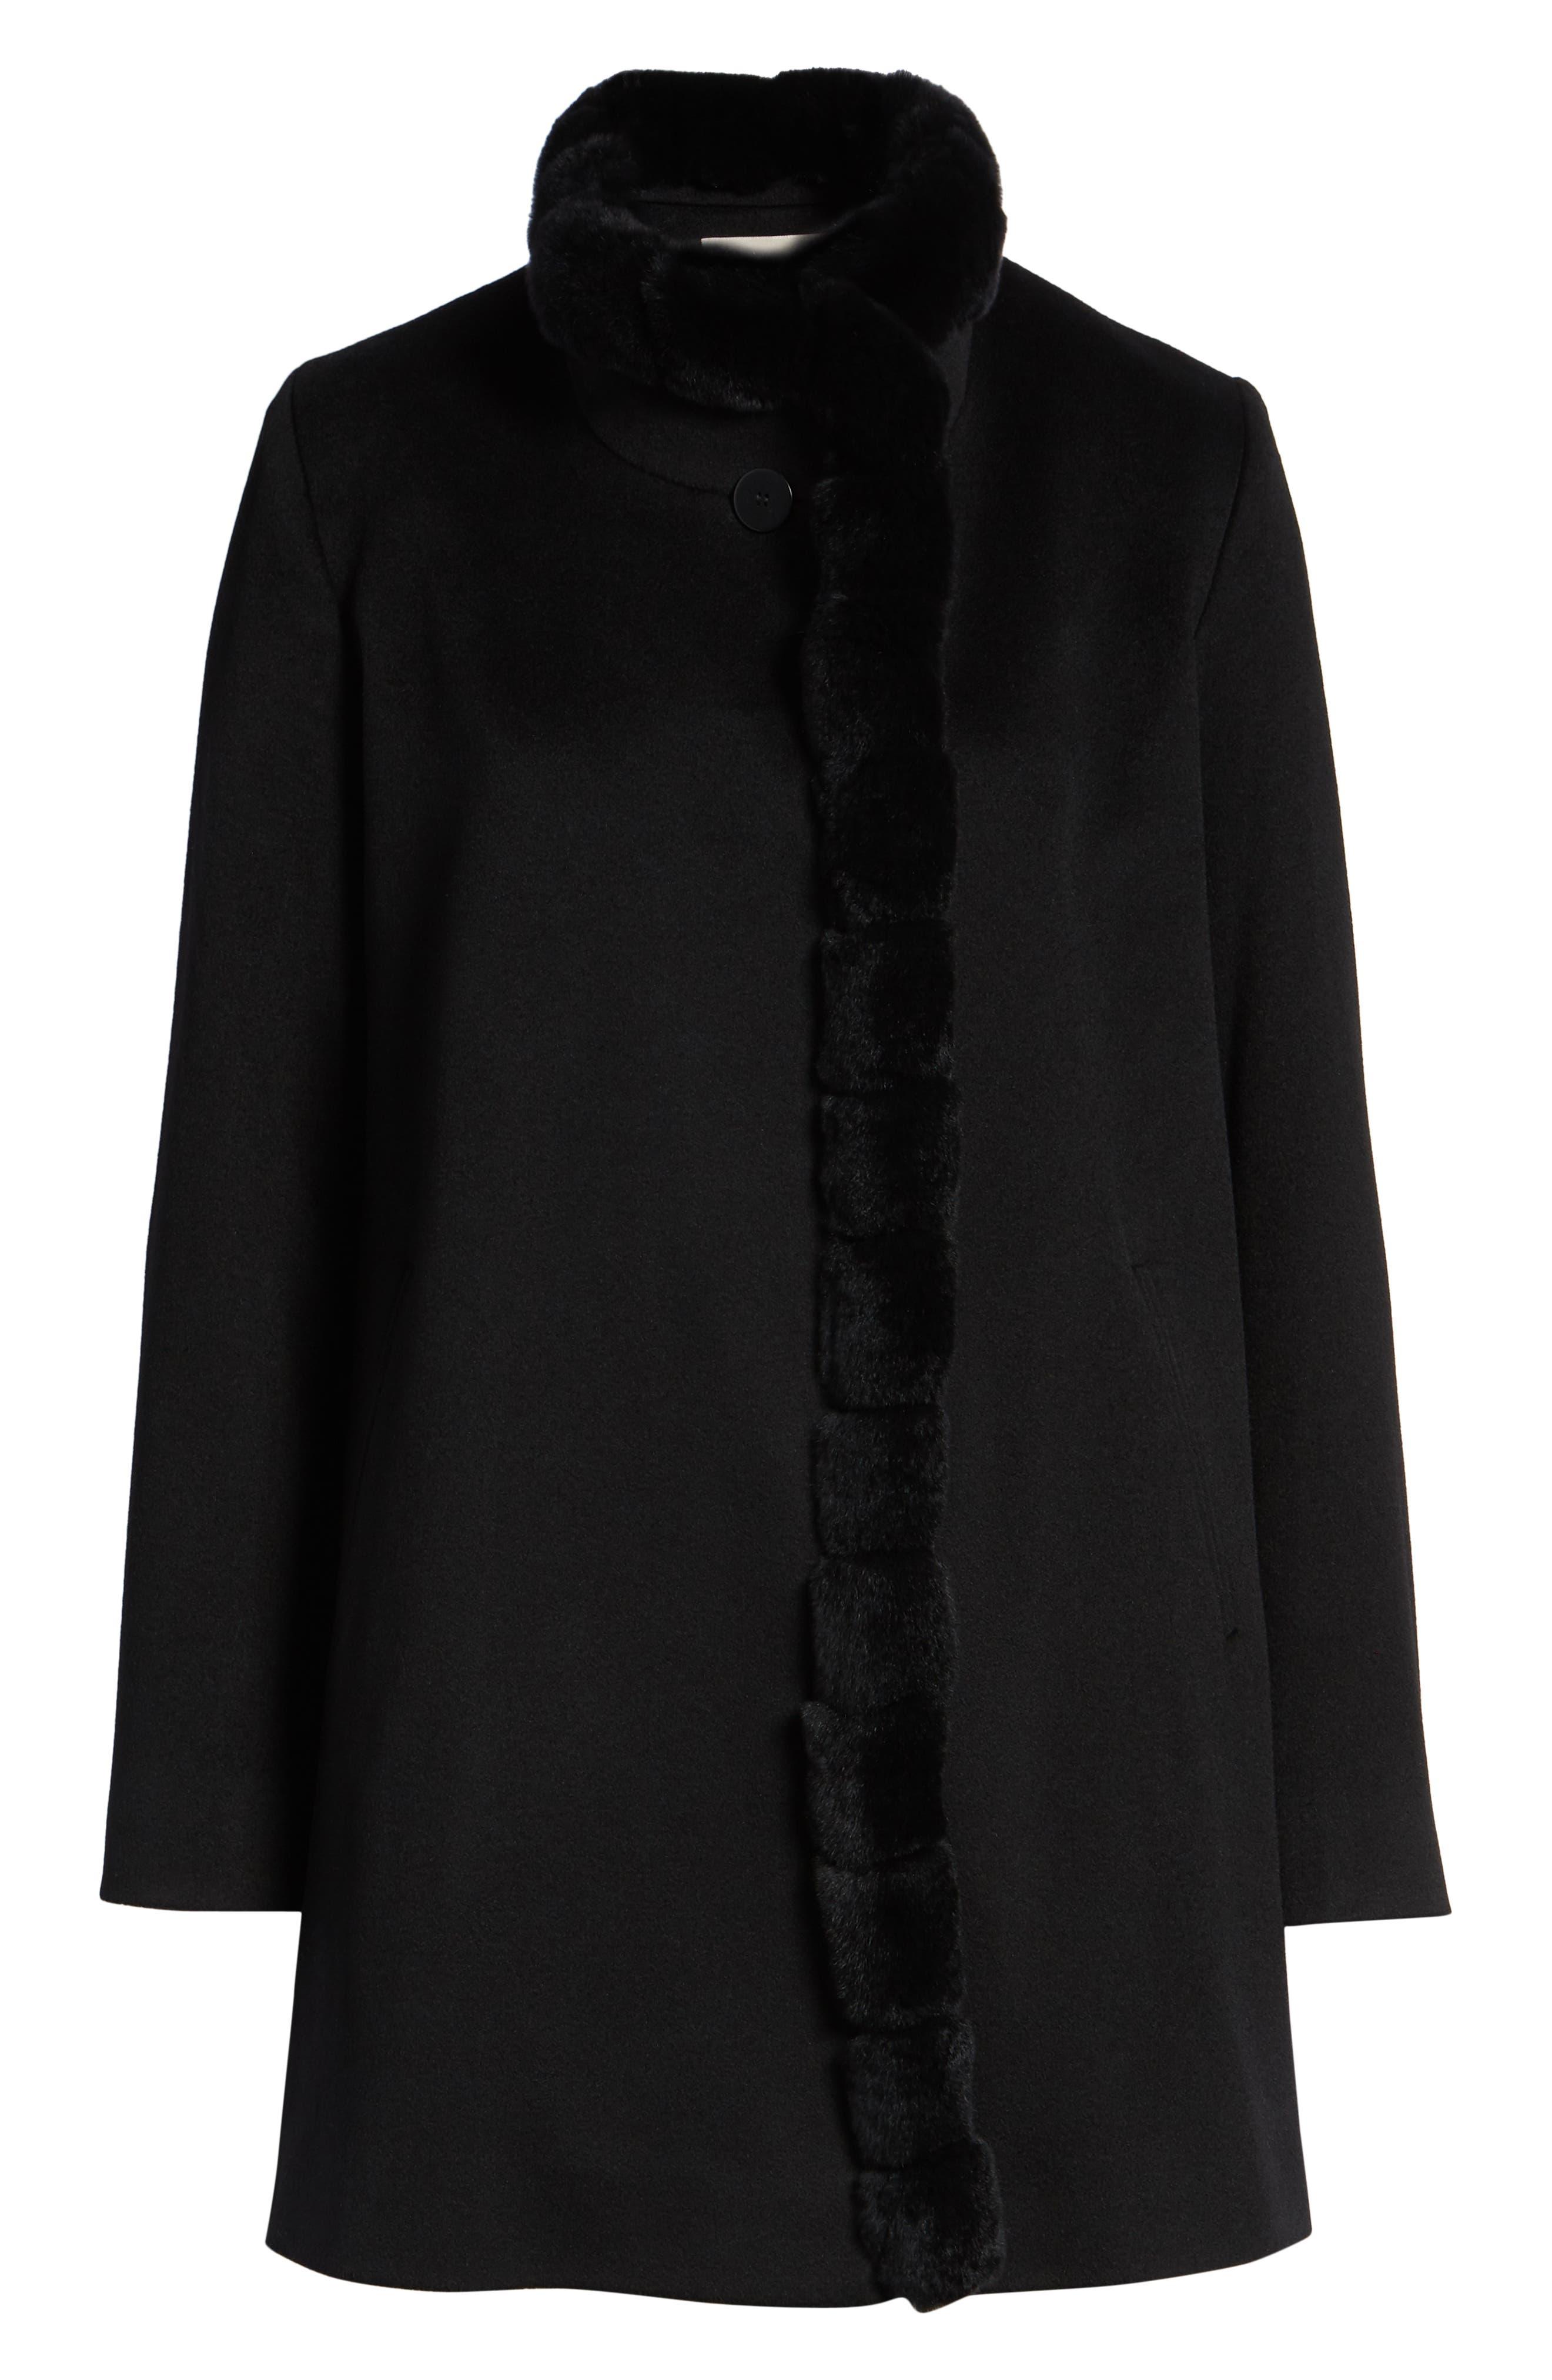 FLEURETTE,                             Loro Piana Wool Car Coat with Genuine Rex Rabbit Fur Trim,                             Alternate thumbnail 6, color,                             001